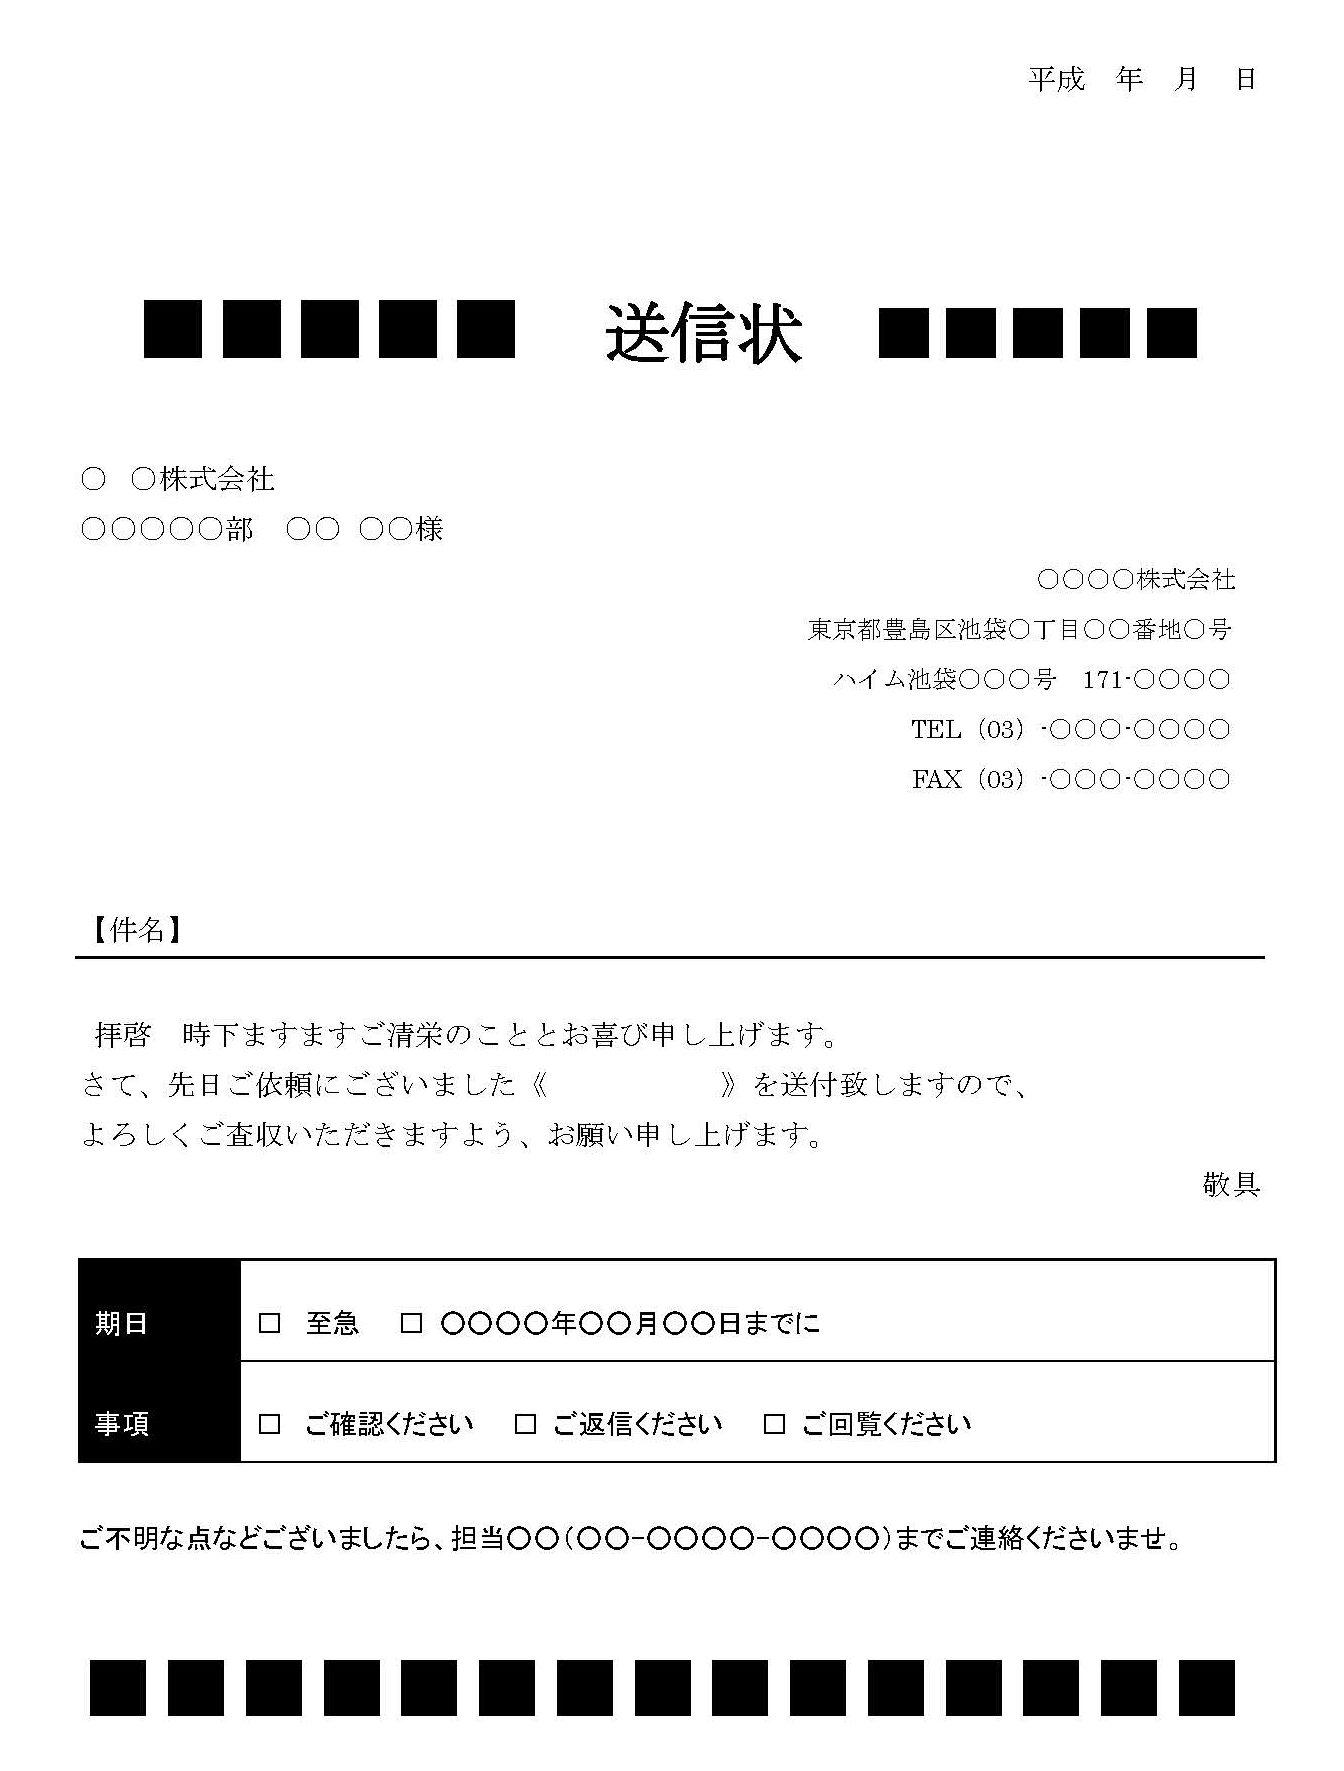 FAX送信状09